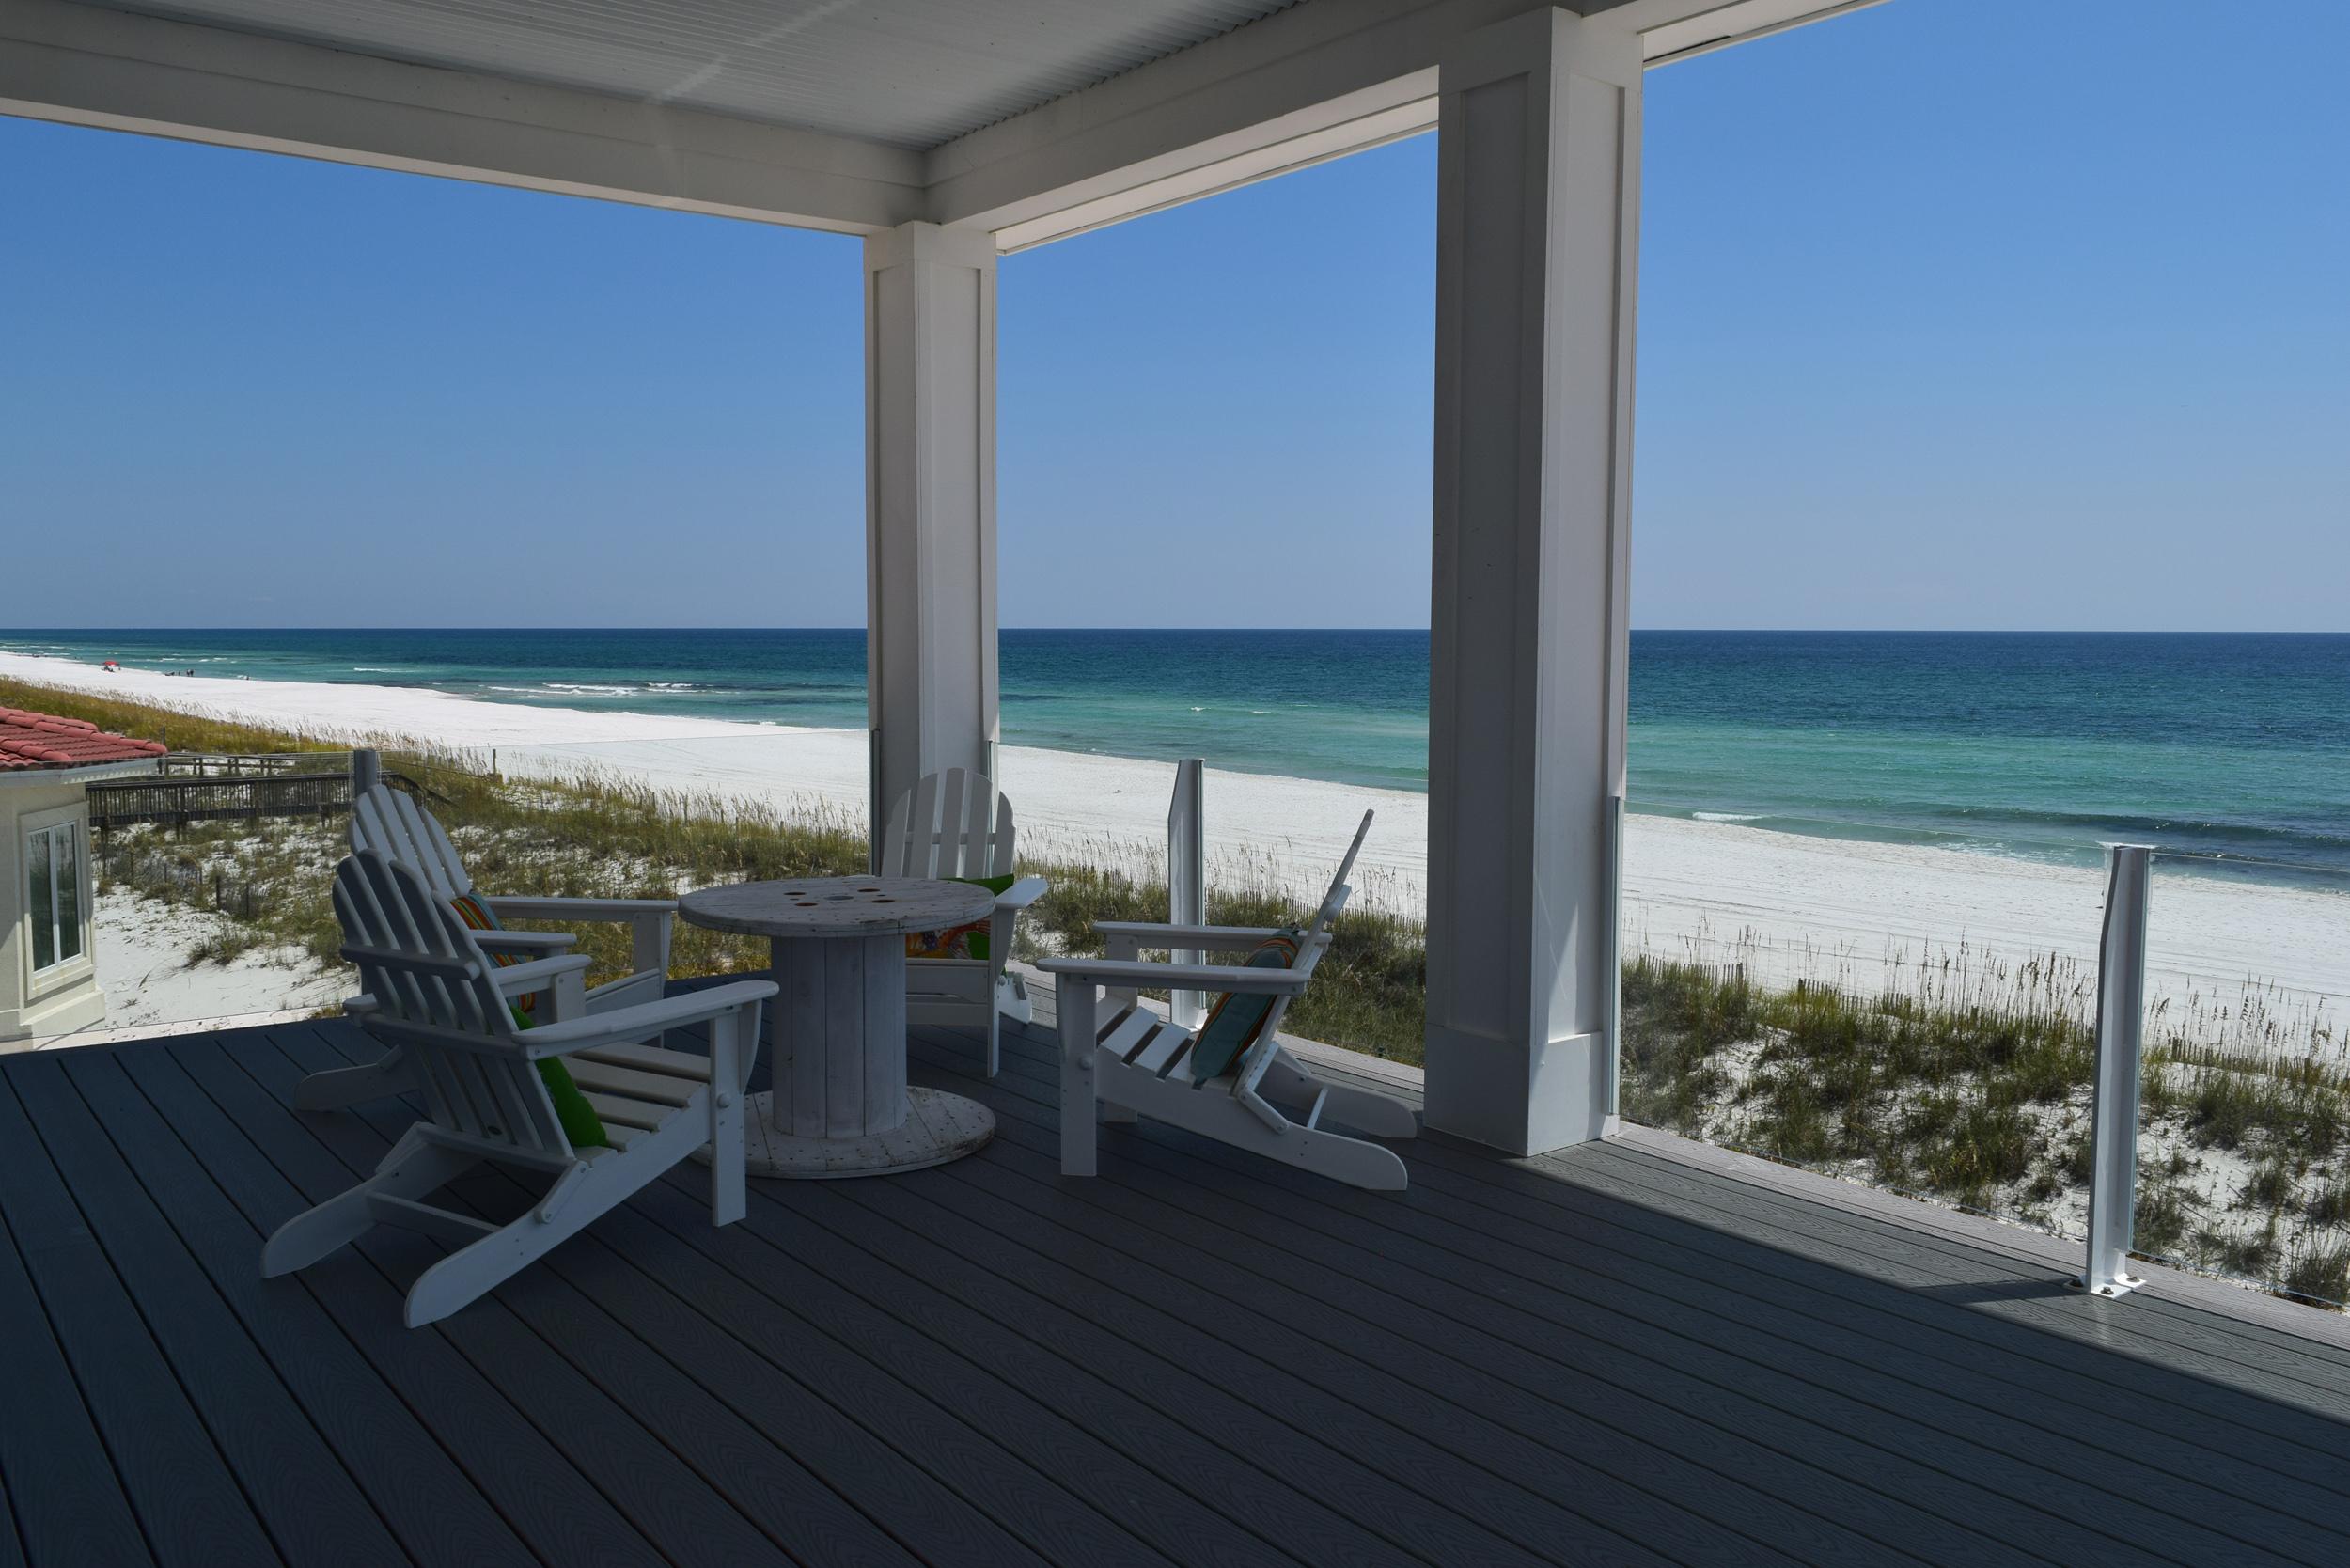 Ariola 1008 House/Cottage rental in Pensacola Beach House Rentals in Pensacola Beach Florida - #47